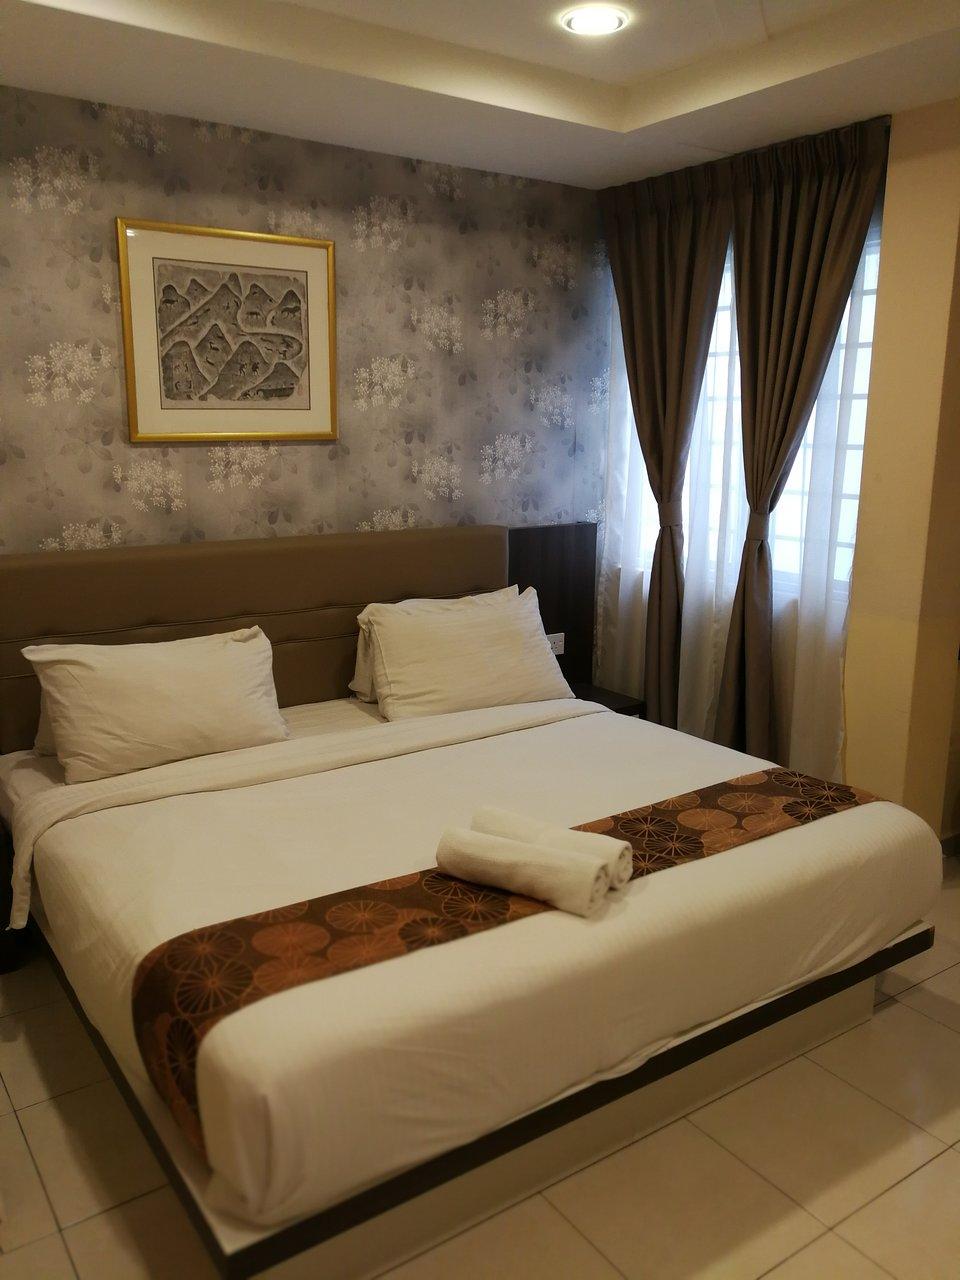 louis hotel updated 2018 reviews price comparison and 56 photos rh tripadvisor com sg